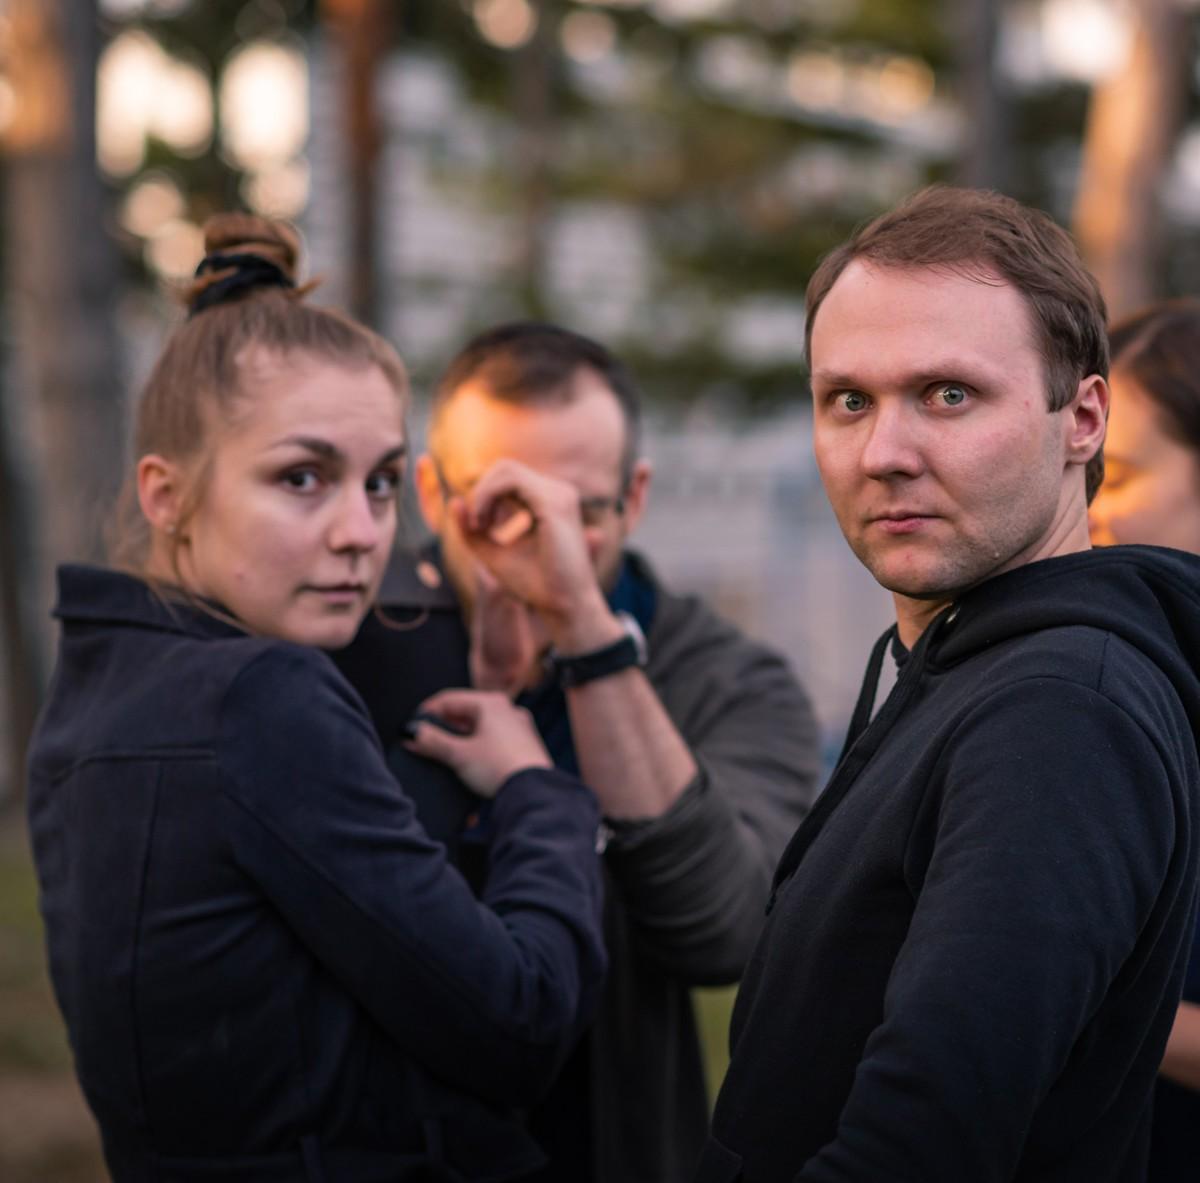 FlyingArchitercure team